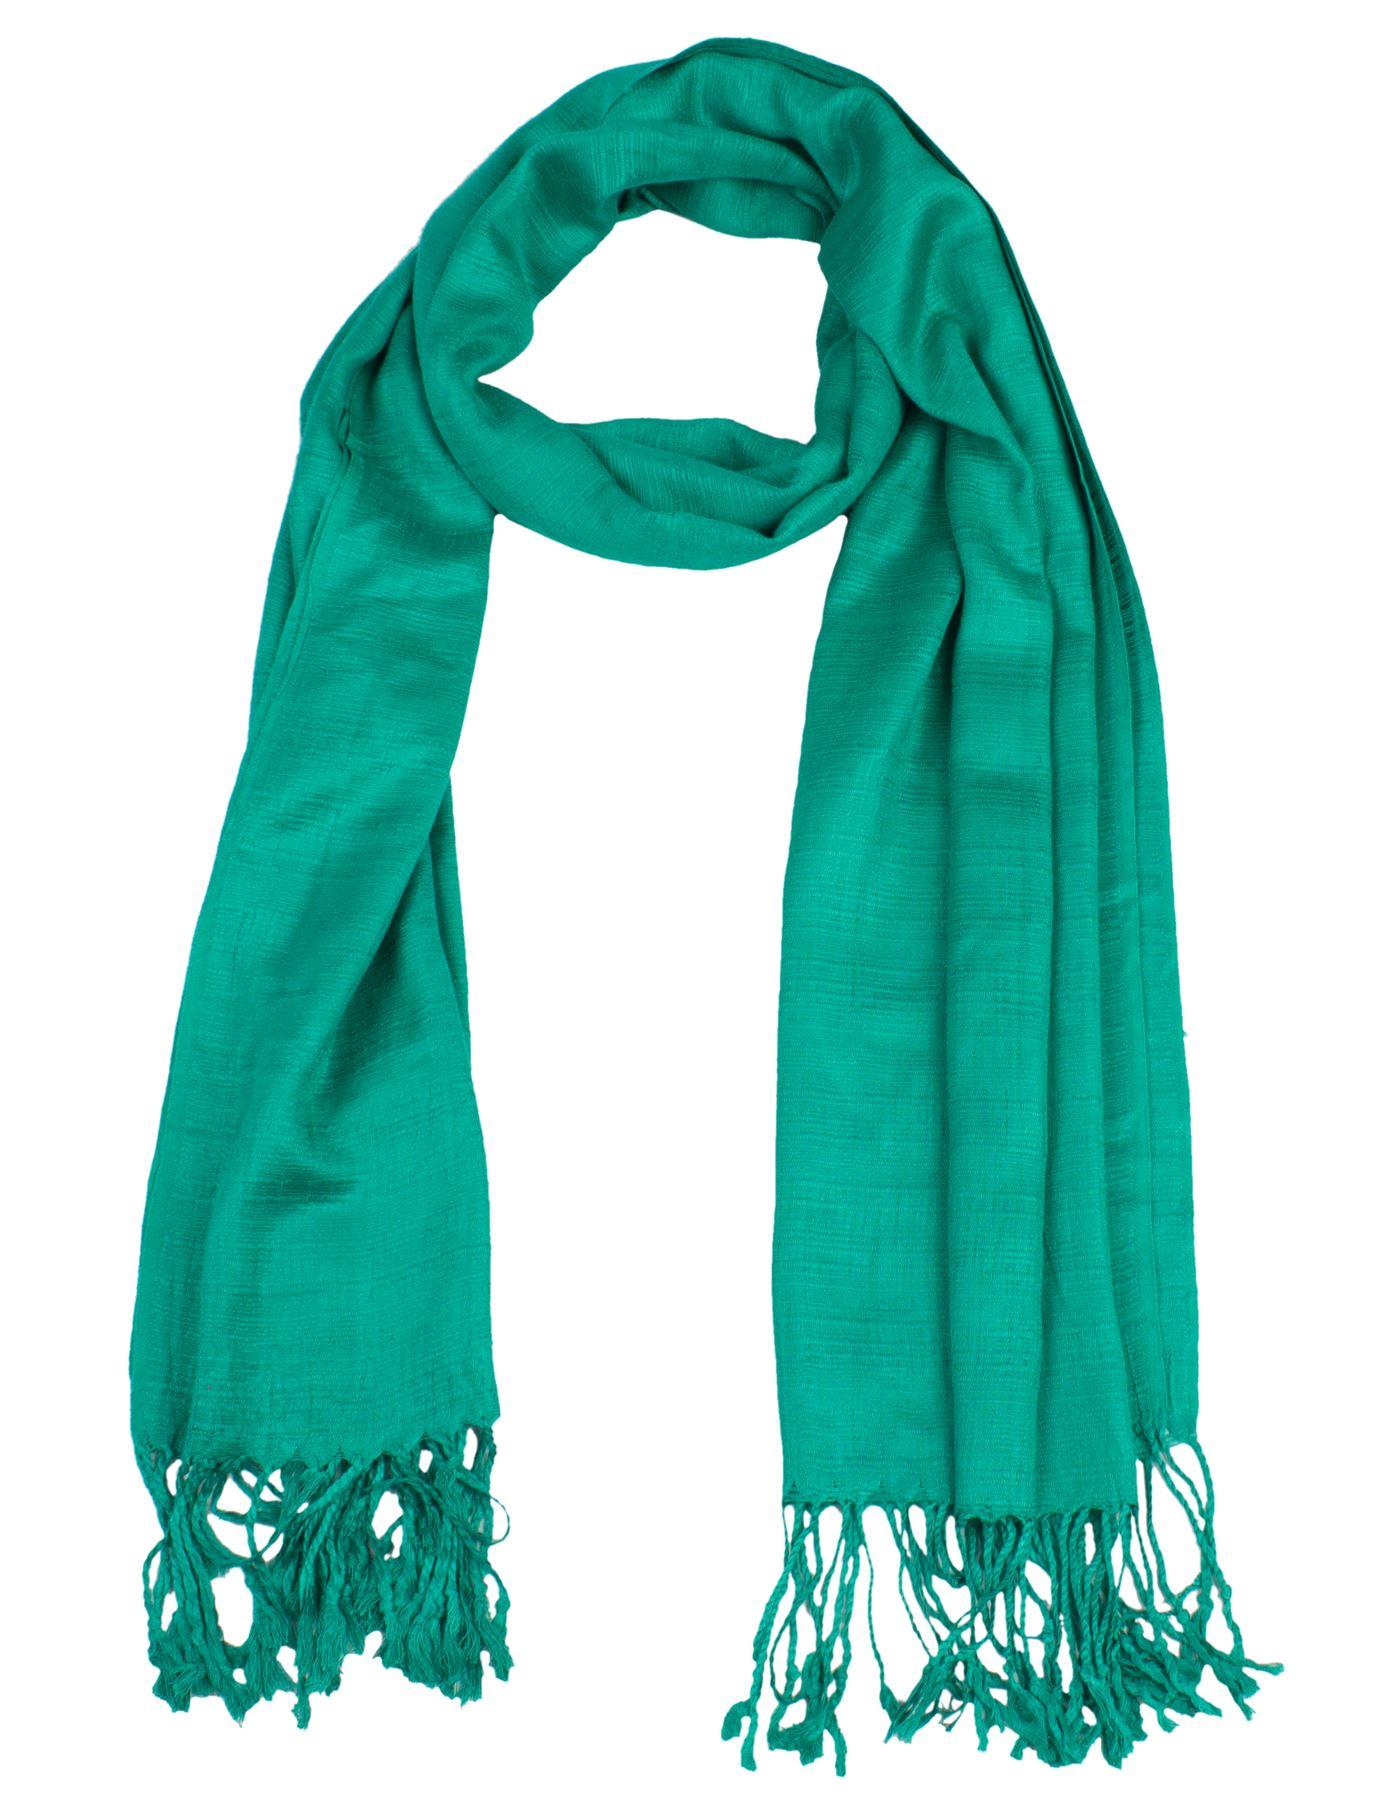 synthetic thai silk scarf shawl wrap large 28x72 handmade